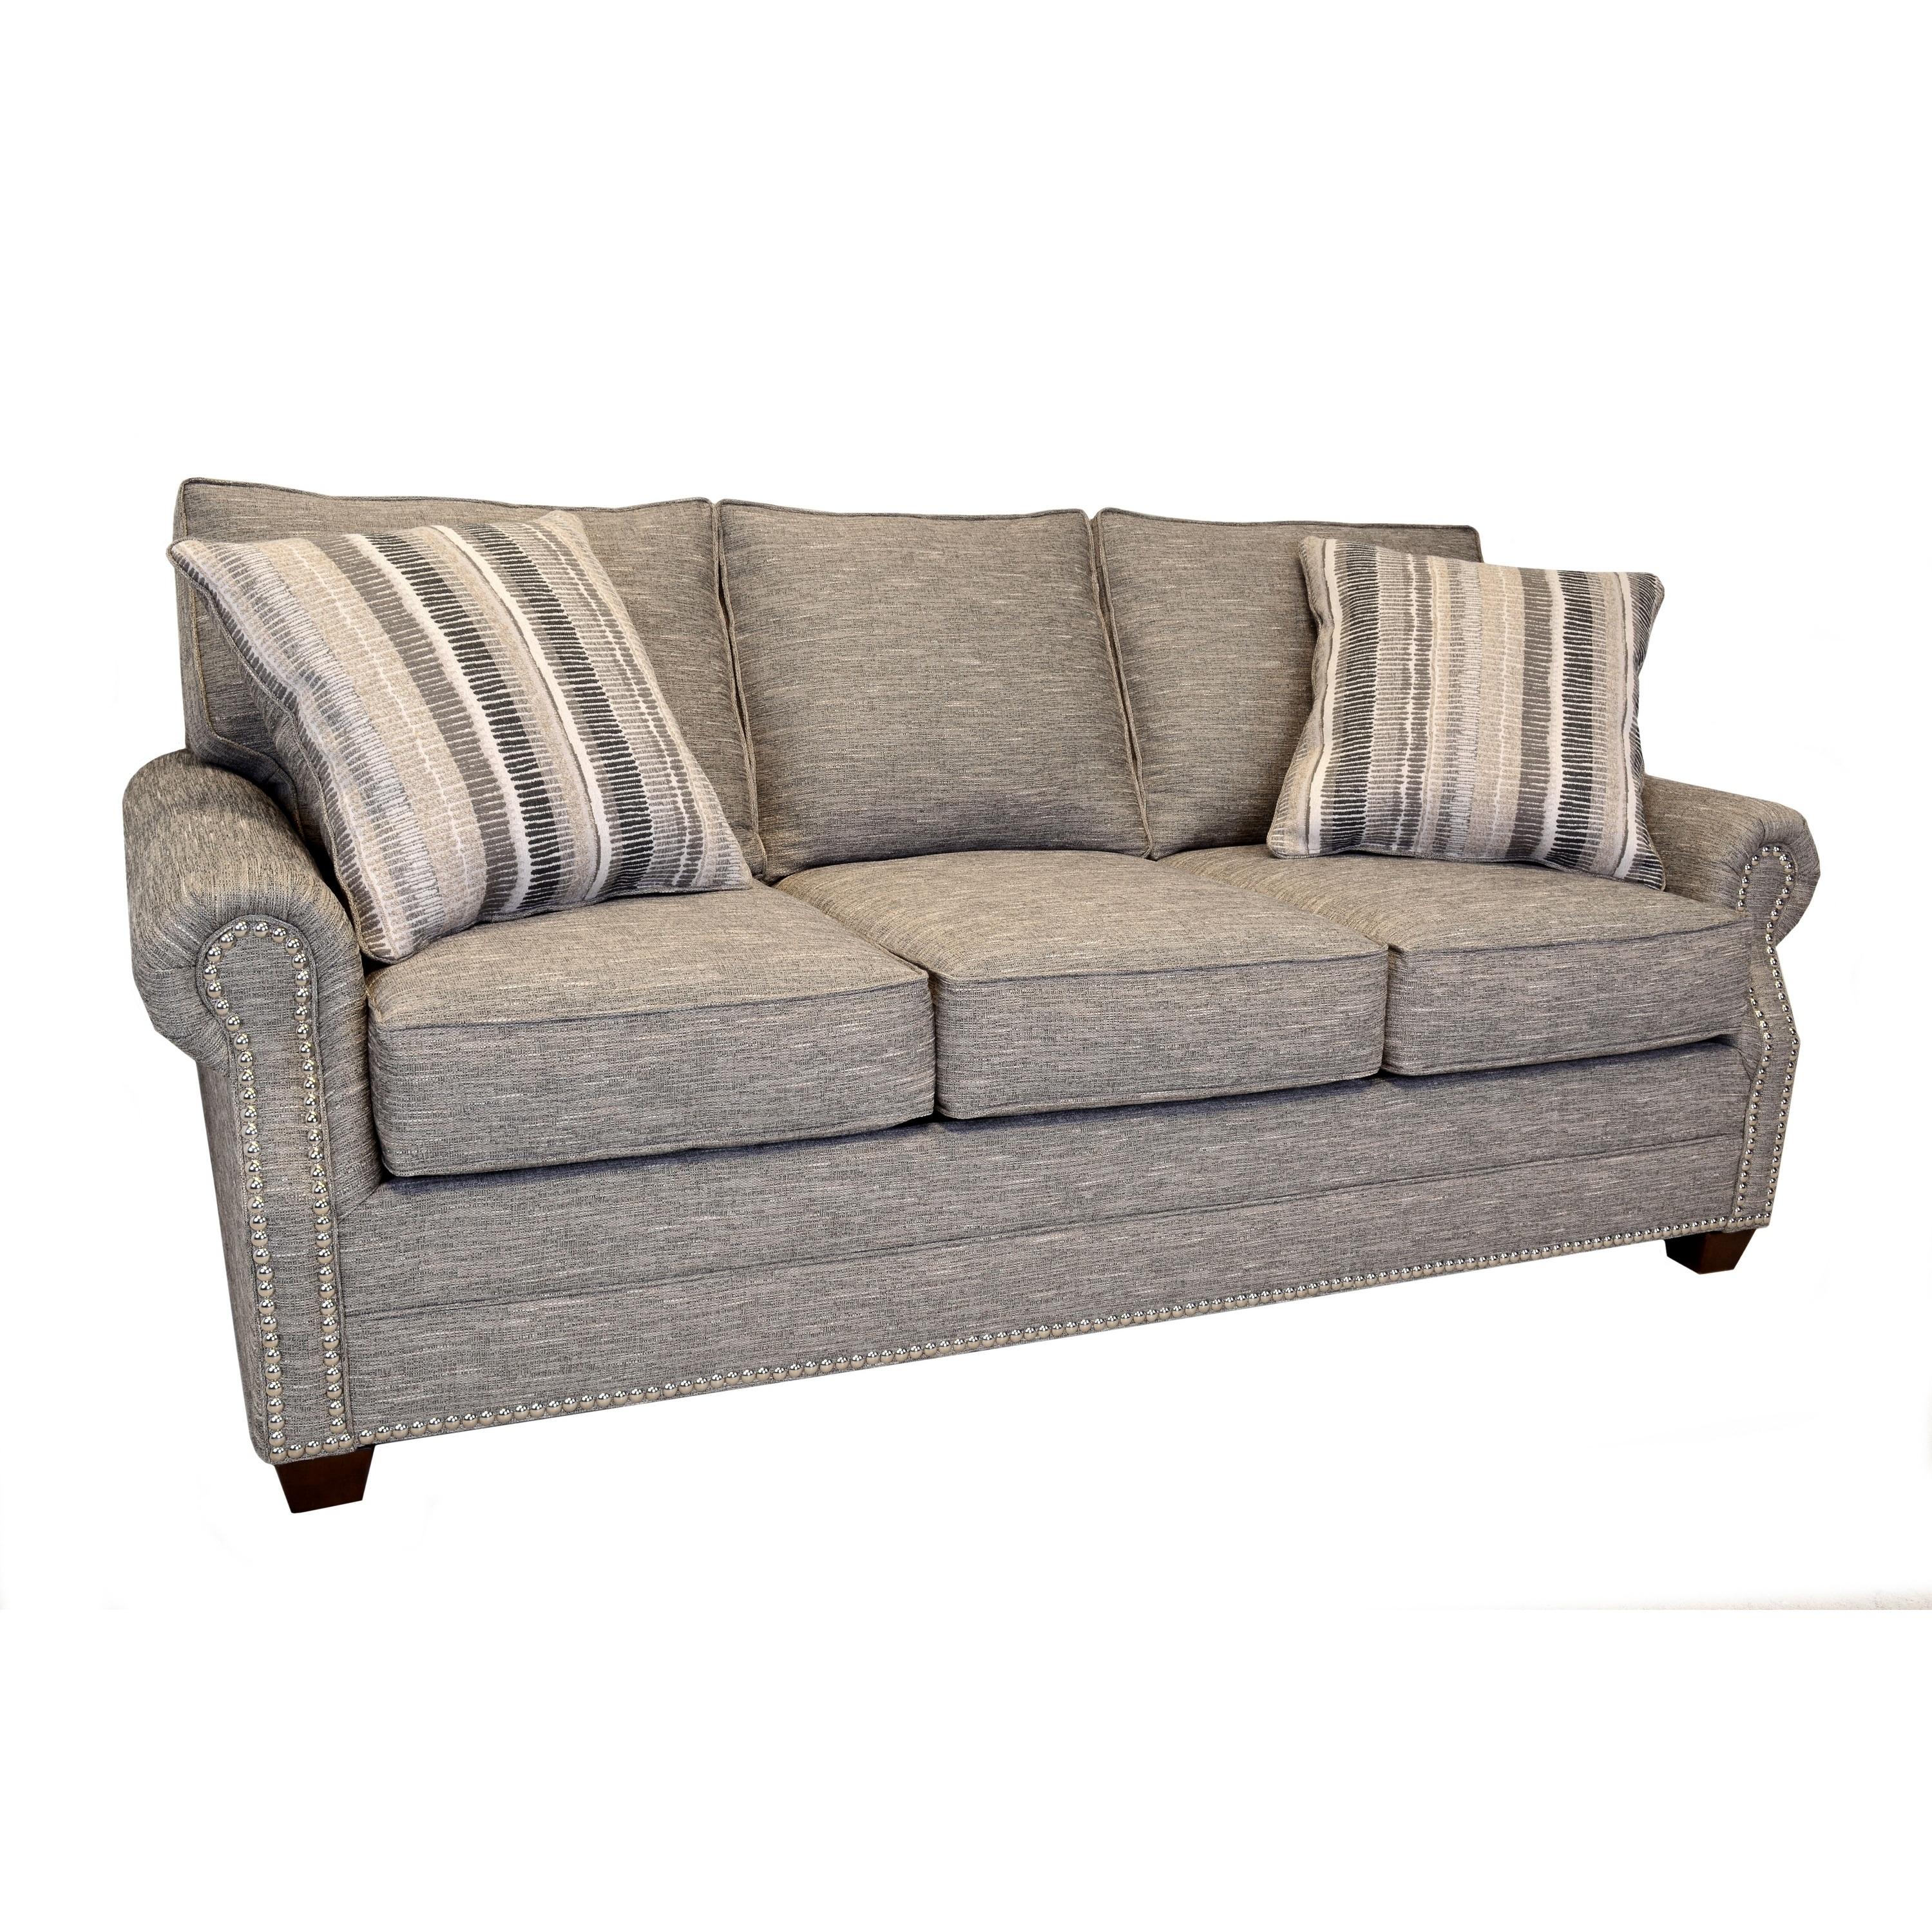 Alston Heather Grey Sofa With Nailhead Trim